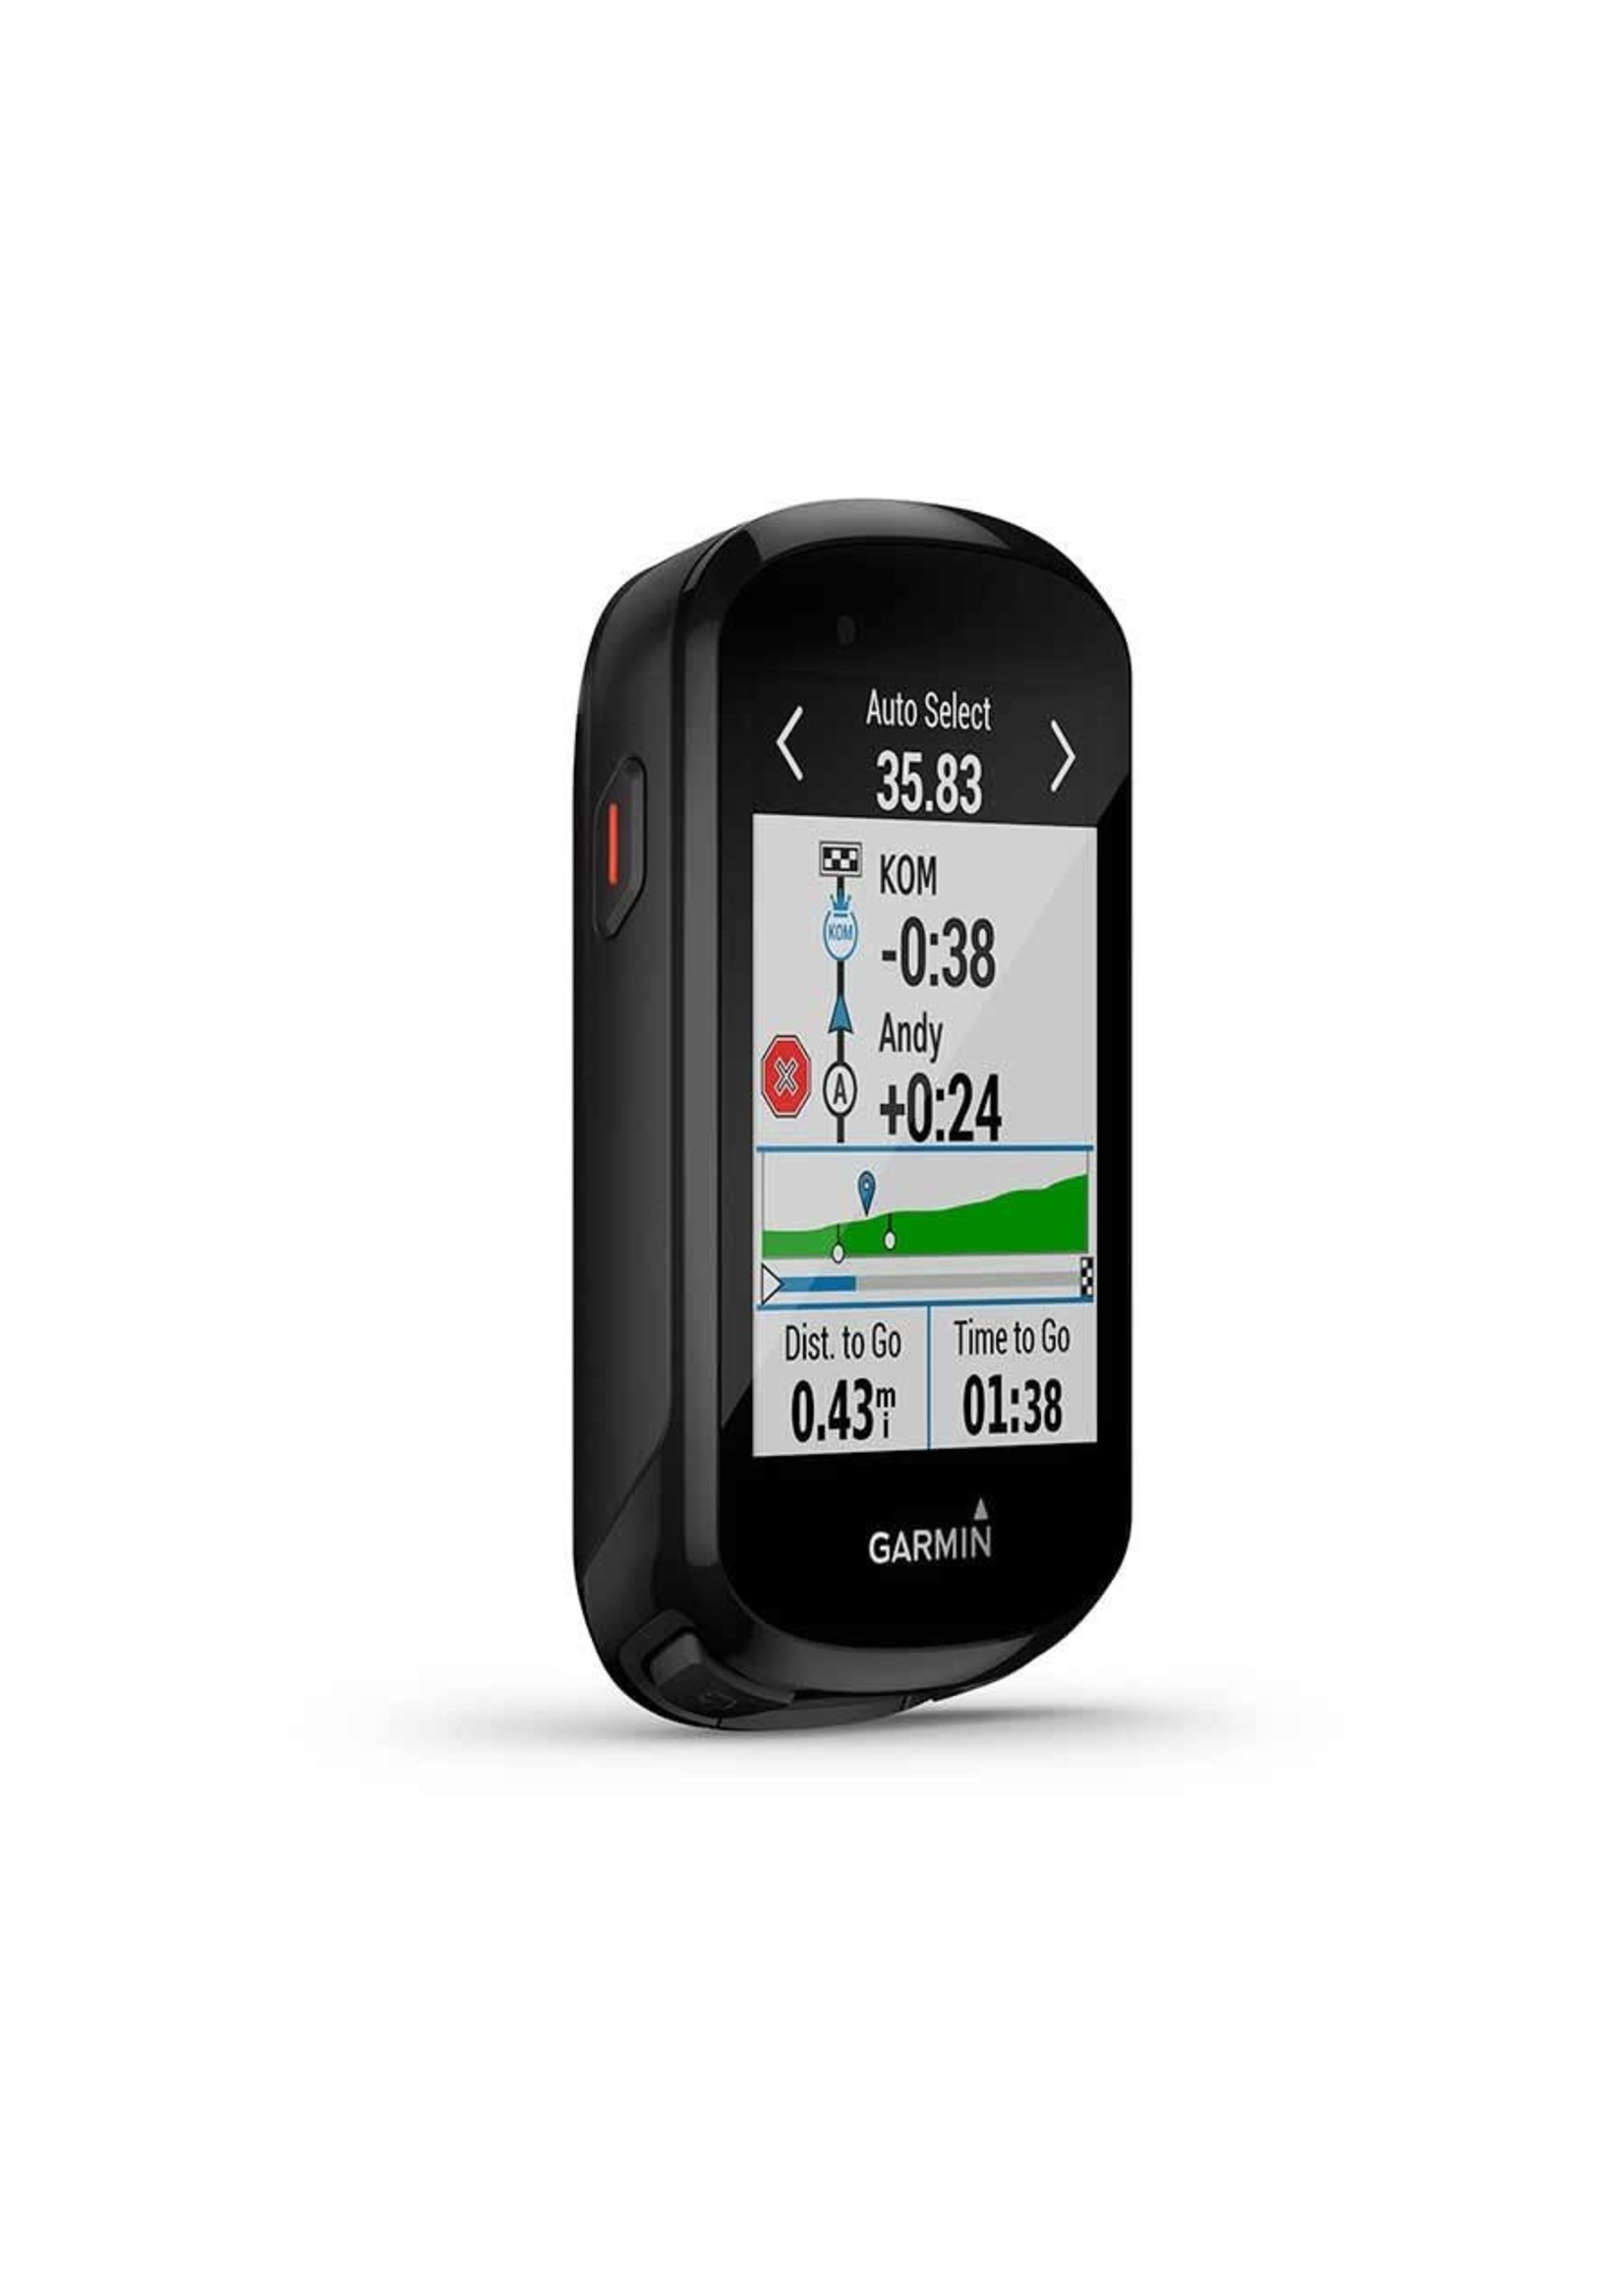 Garmin Garmin, Edge 830, Cyclometre, GPS: Oui, Cardio: En option, Cadence: Optionnelle, Noir, 010-02061-00